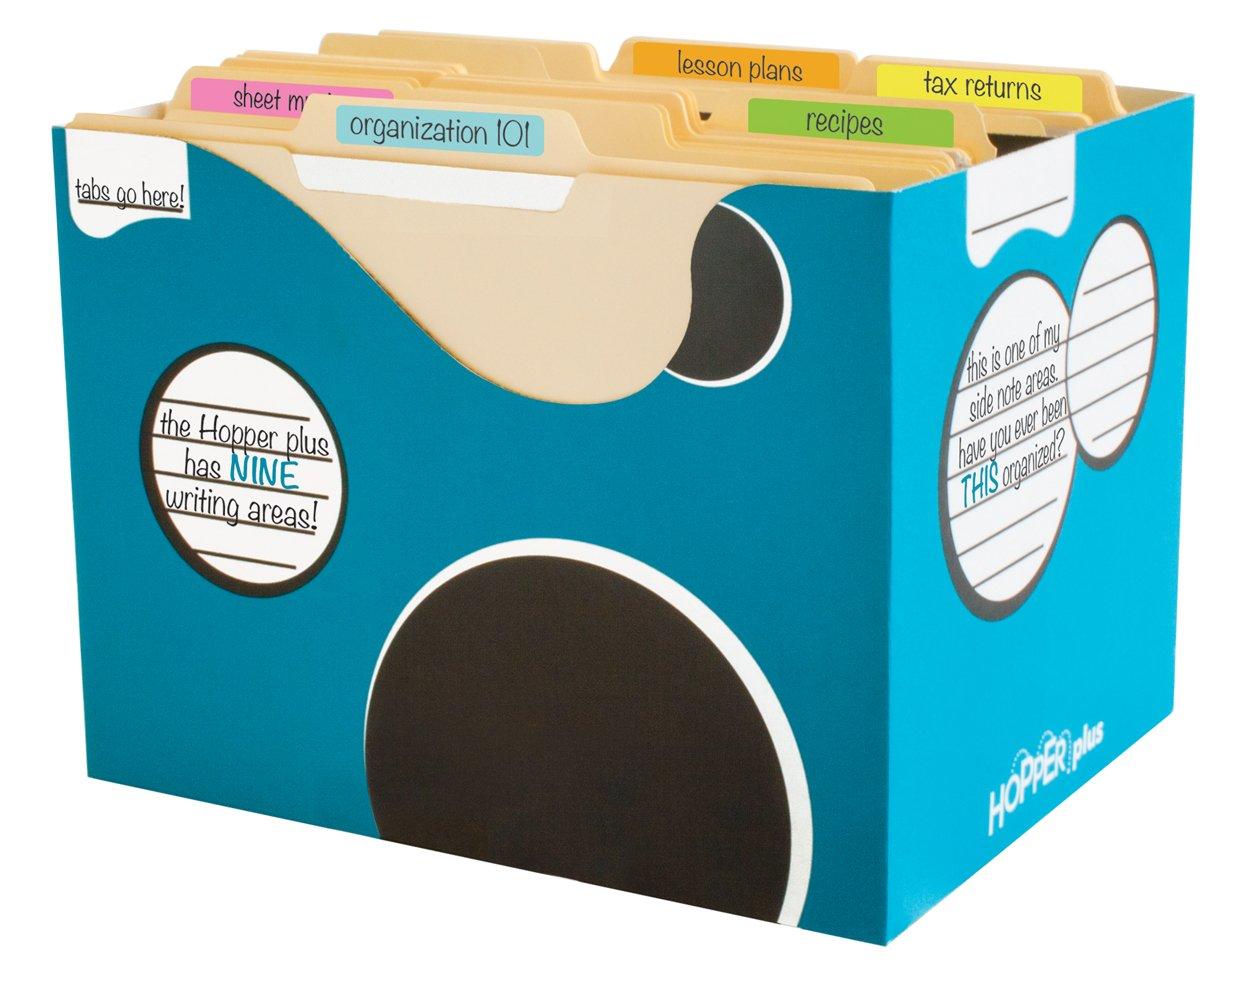 Boxa HOPPER PLUS Bigger School Supply Organizer Bin, 21 per Pack (4-HP08-0-BB-03)